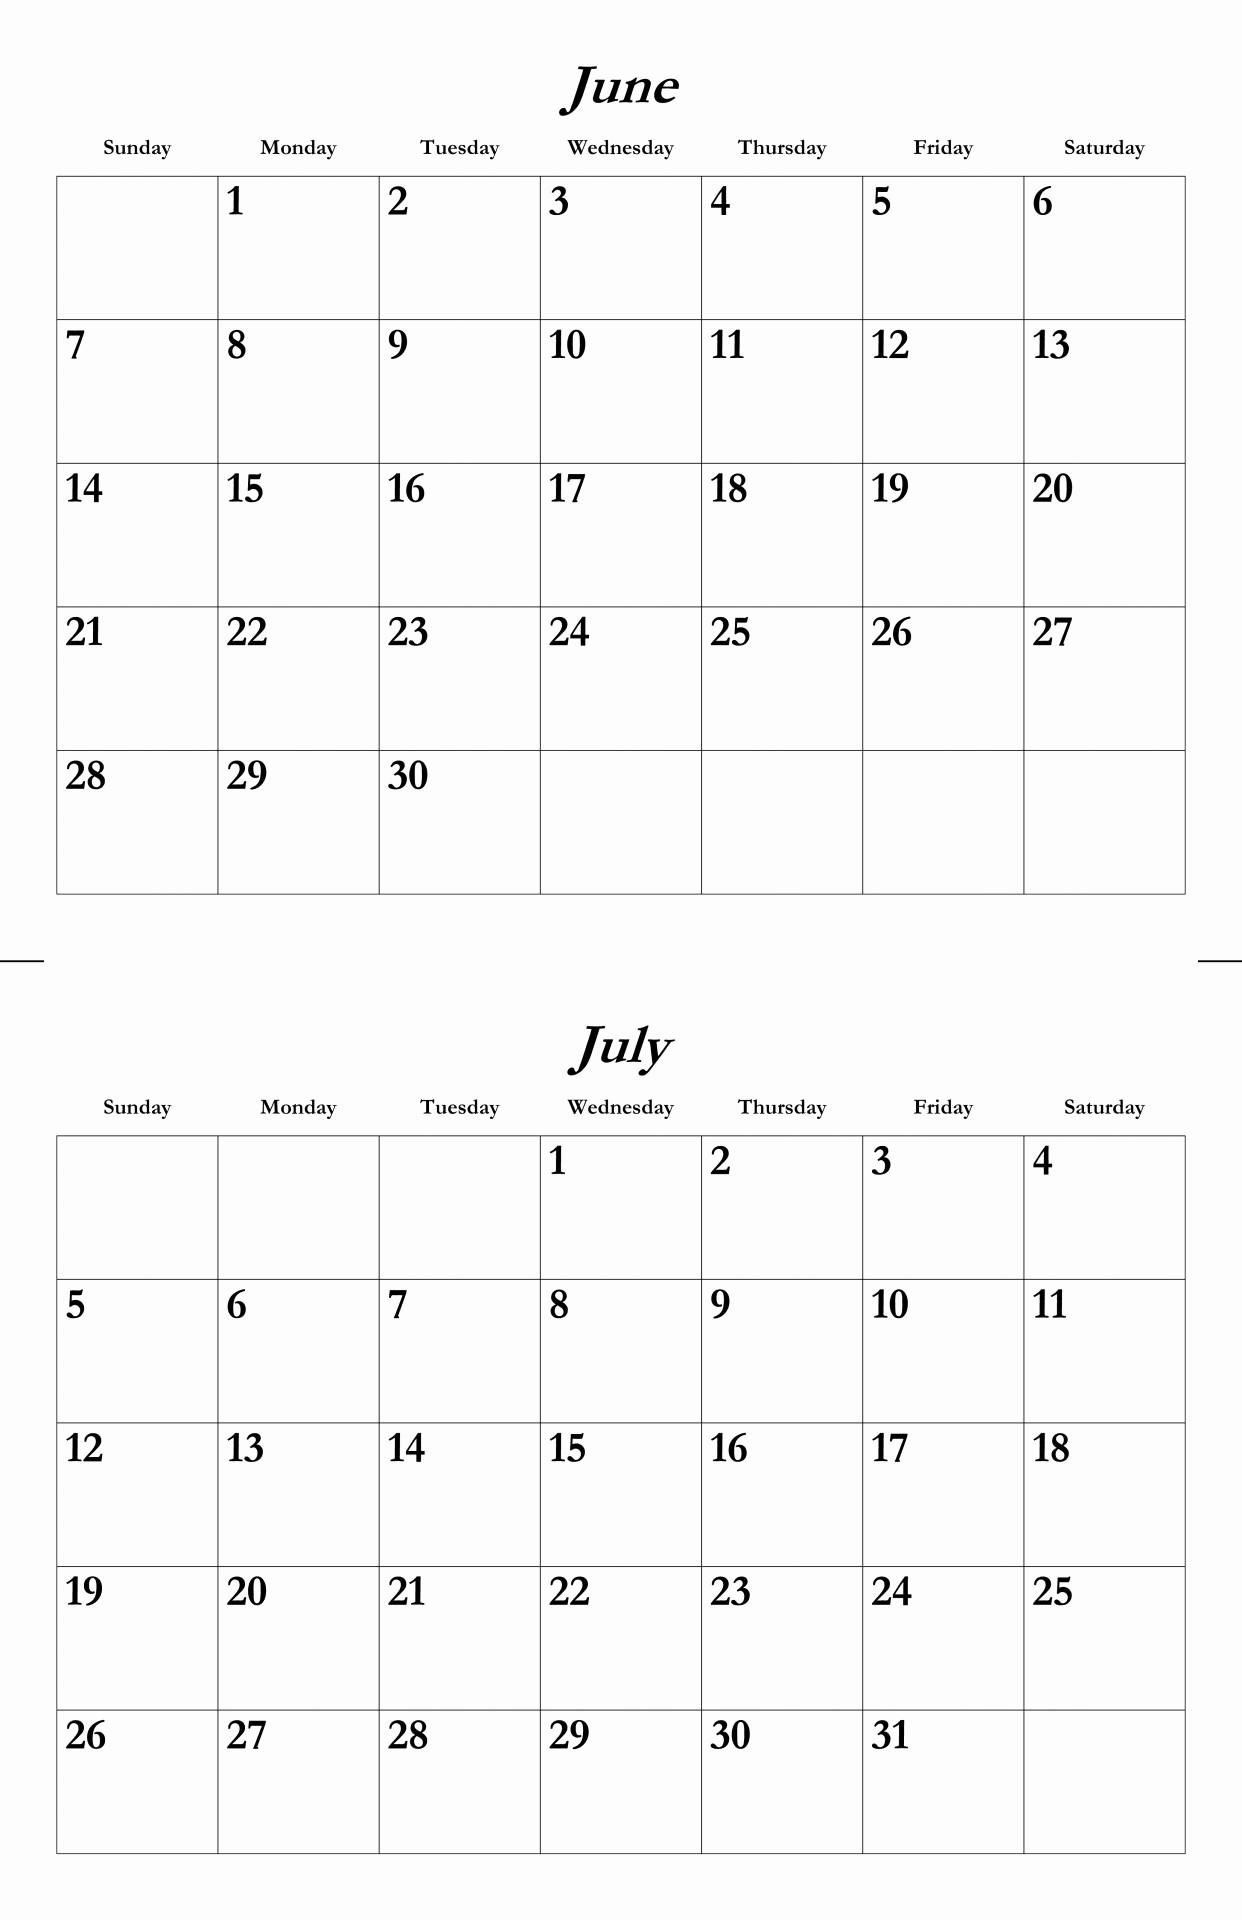 Printable 3 Month Calendar 2015 Beautiful 2015 Calendar Printable by Month – 2017 Printable Calendar